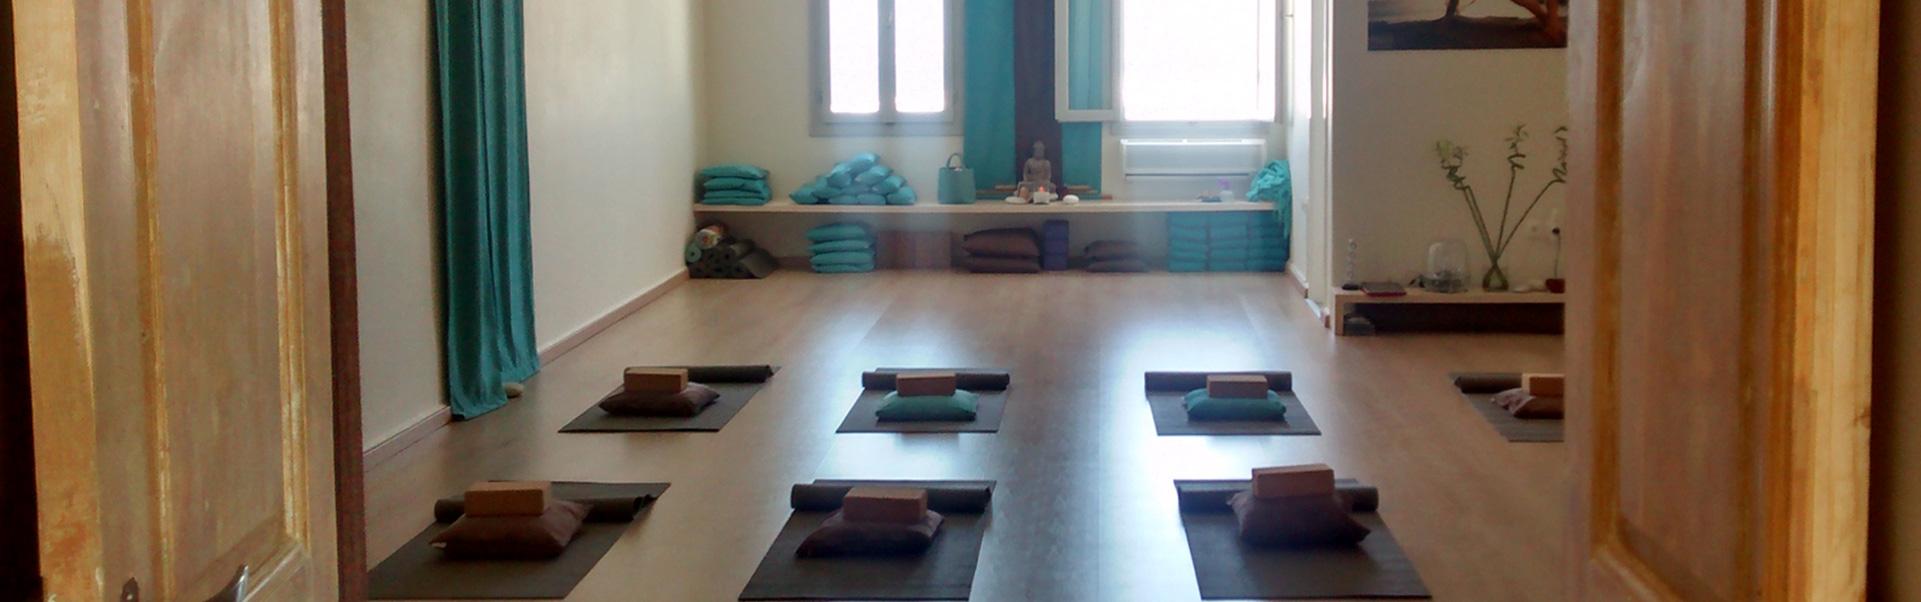 paros yoga shala mandala schedule - anapnoe yoga - by paros yoga shala